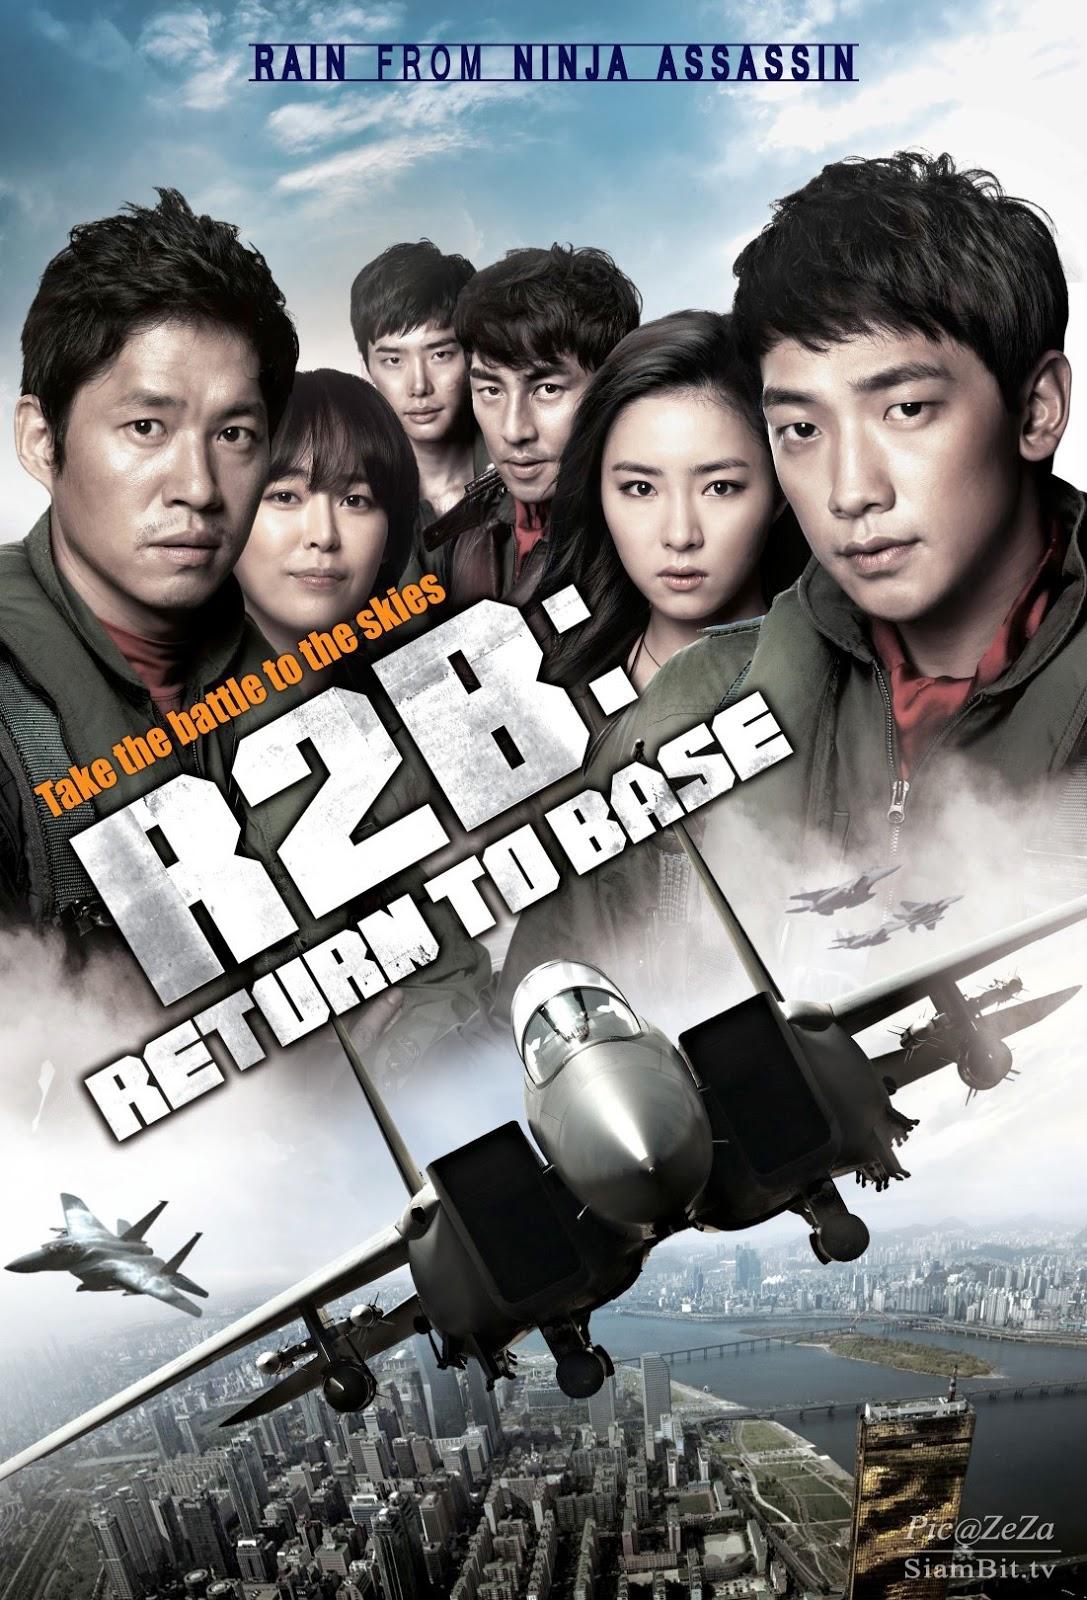 R2B : Return Toa Bse (2012) ยุทธการโฉบเหนือฟ้า